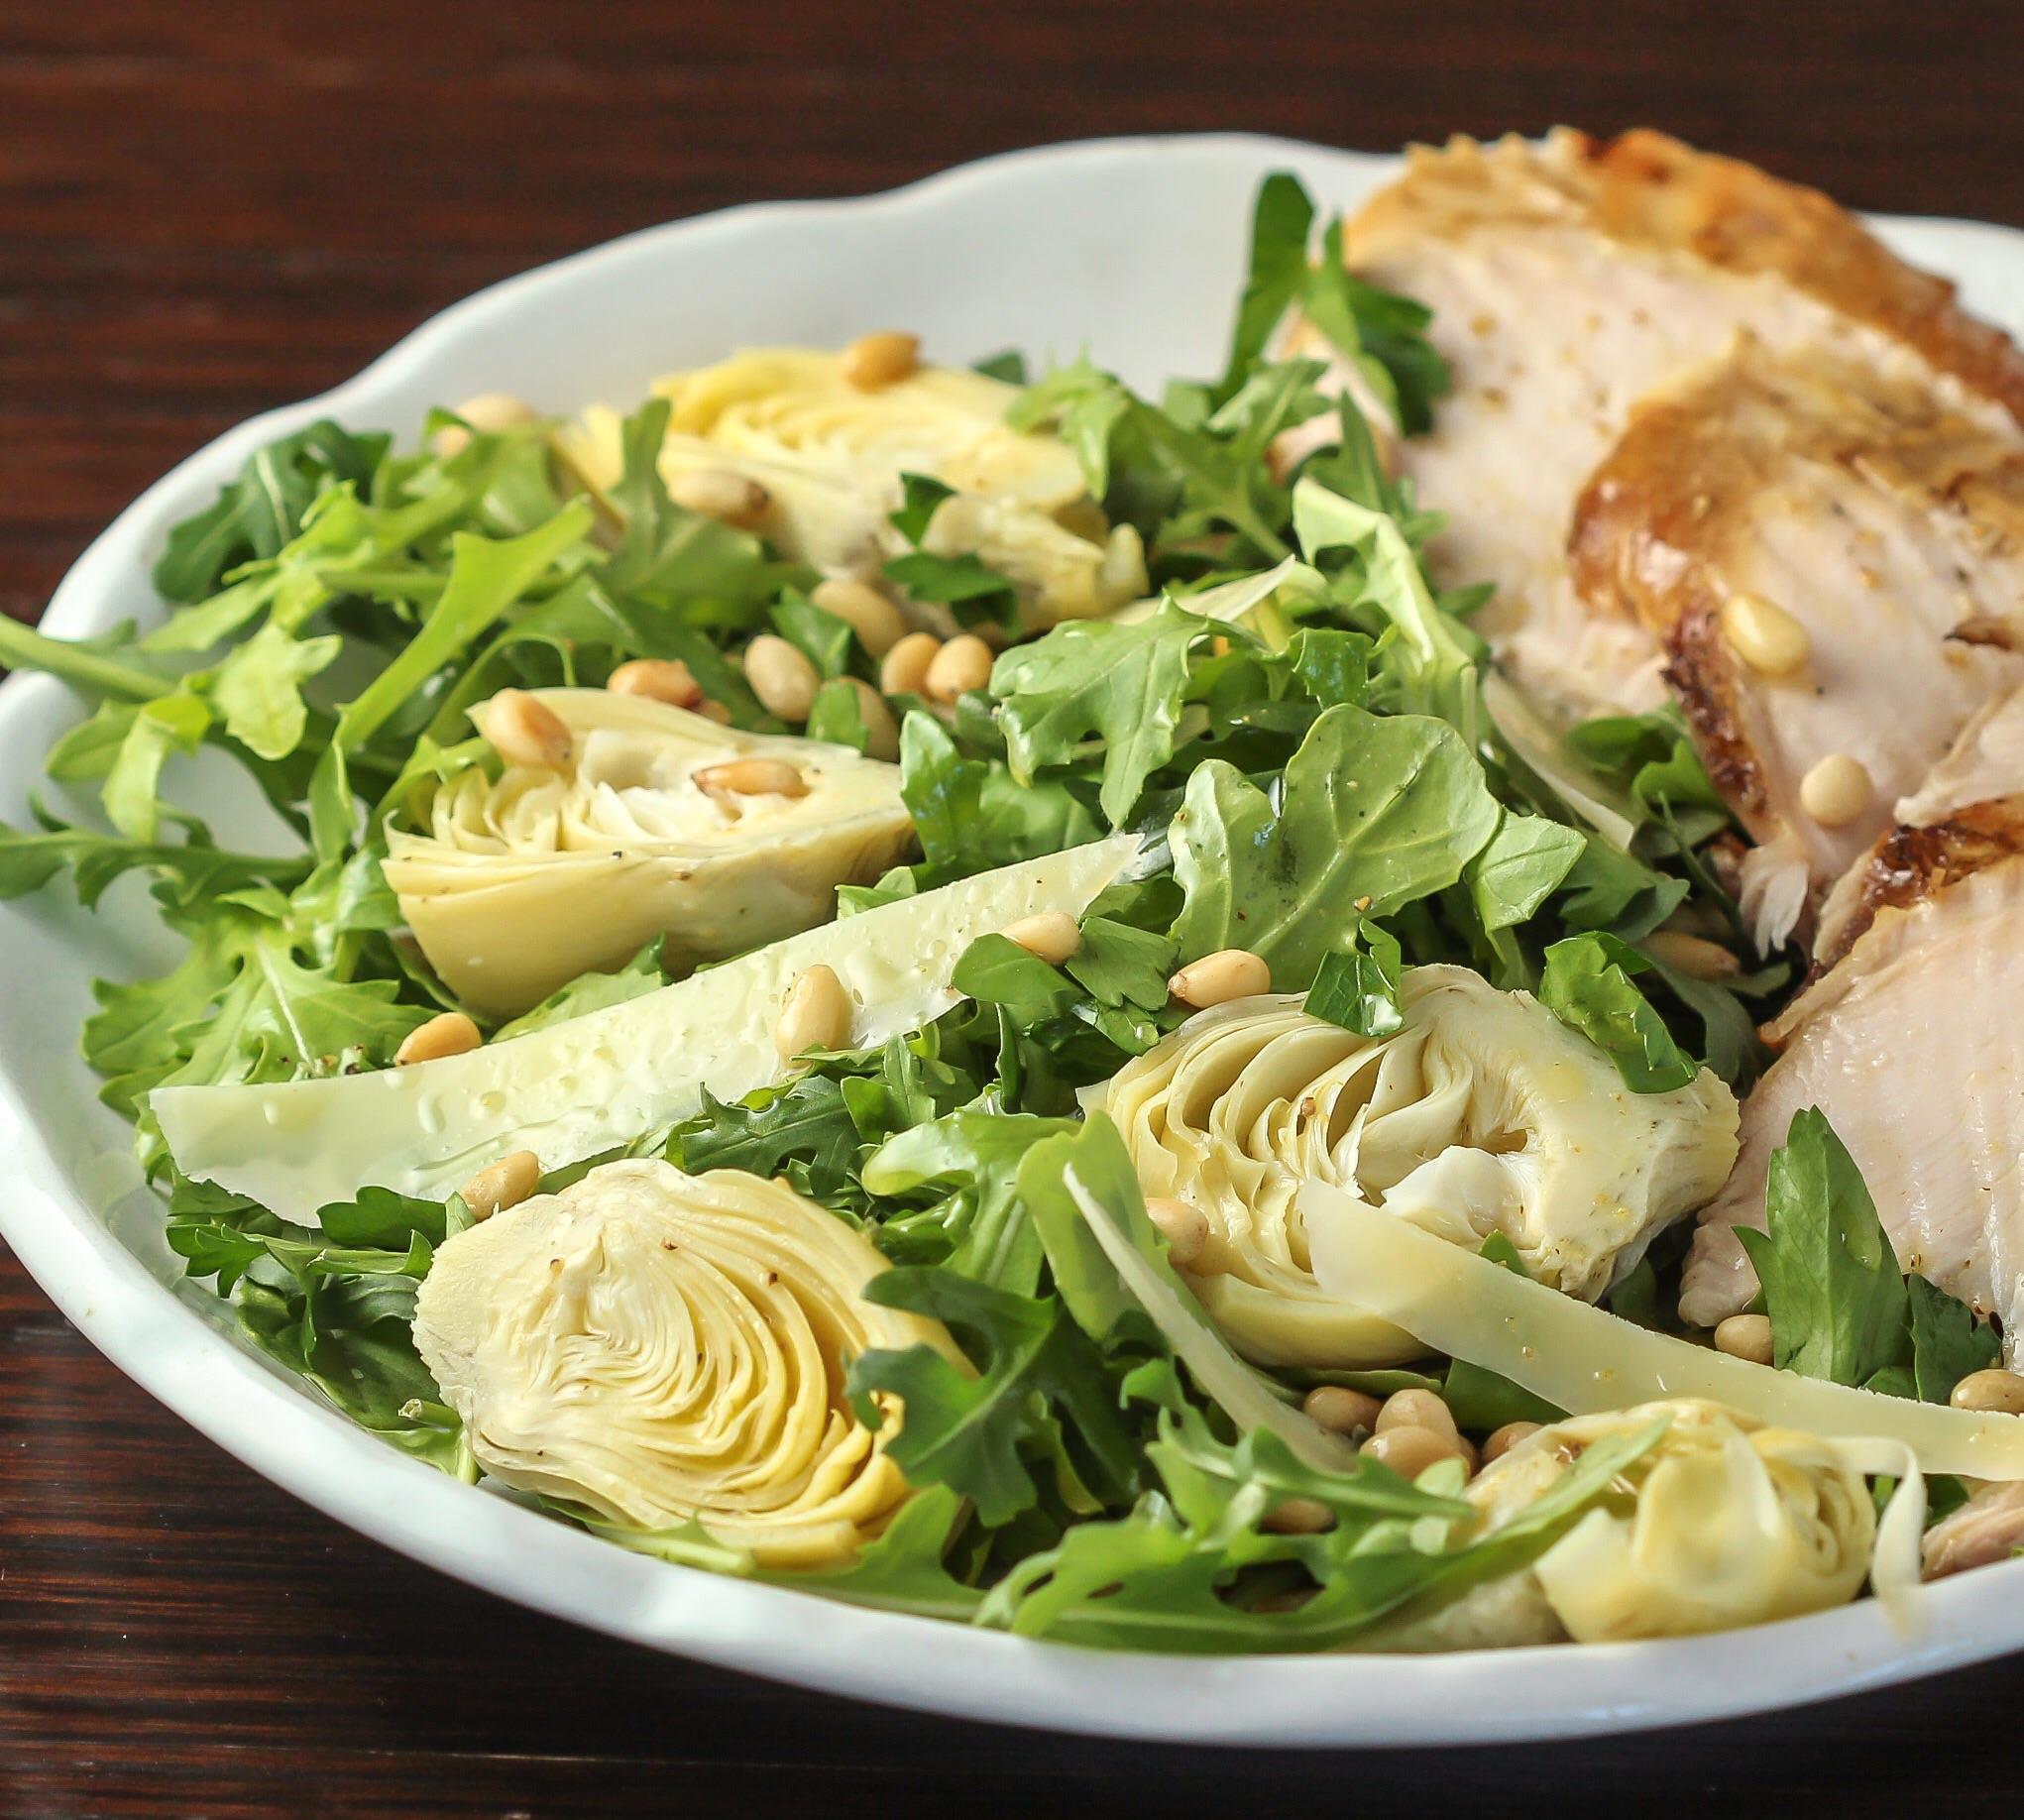 Salad with Pecorino Romano Cheese, Pine Nuts and Lemon Vinaigrette